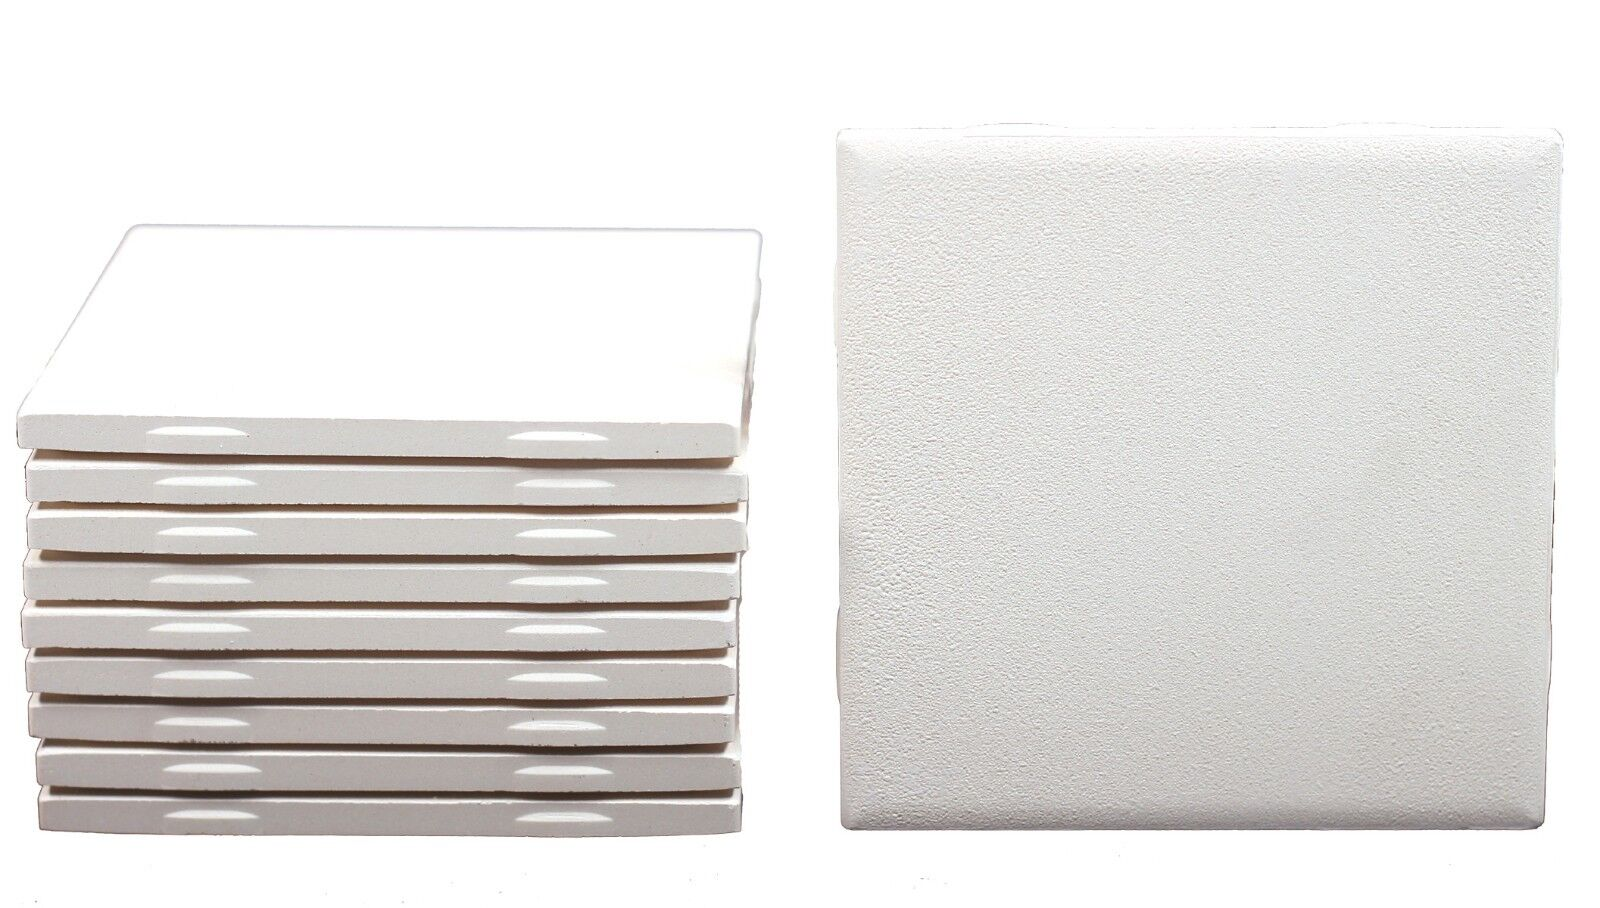 4.25″ Square Un-glazed Ceramic Bisque Tiles for Decorating -Box of 10 Tiles Ceramics & Pottery